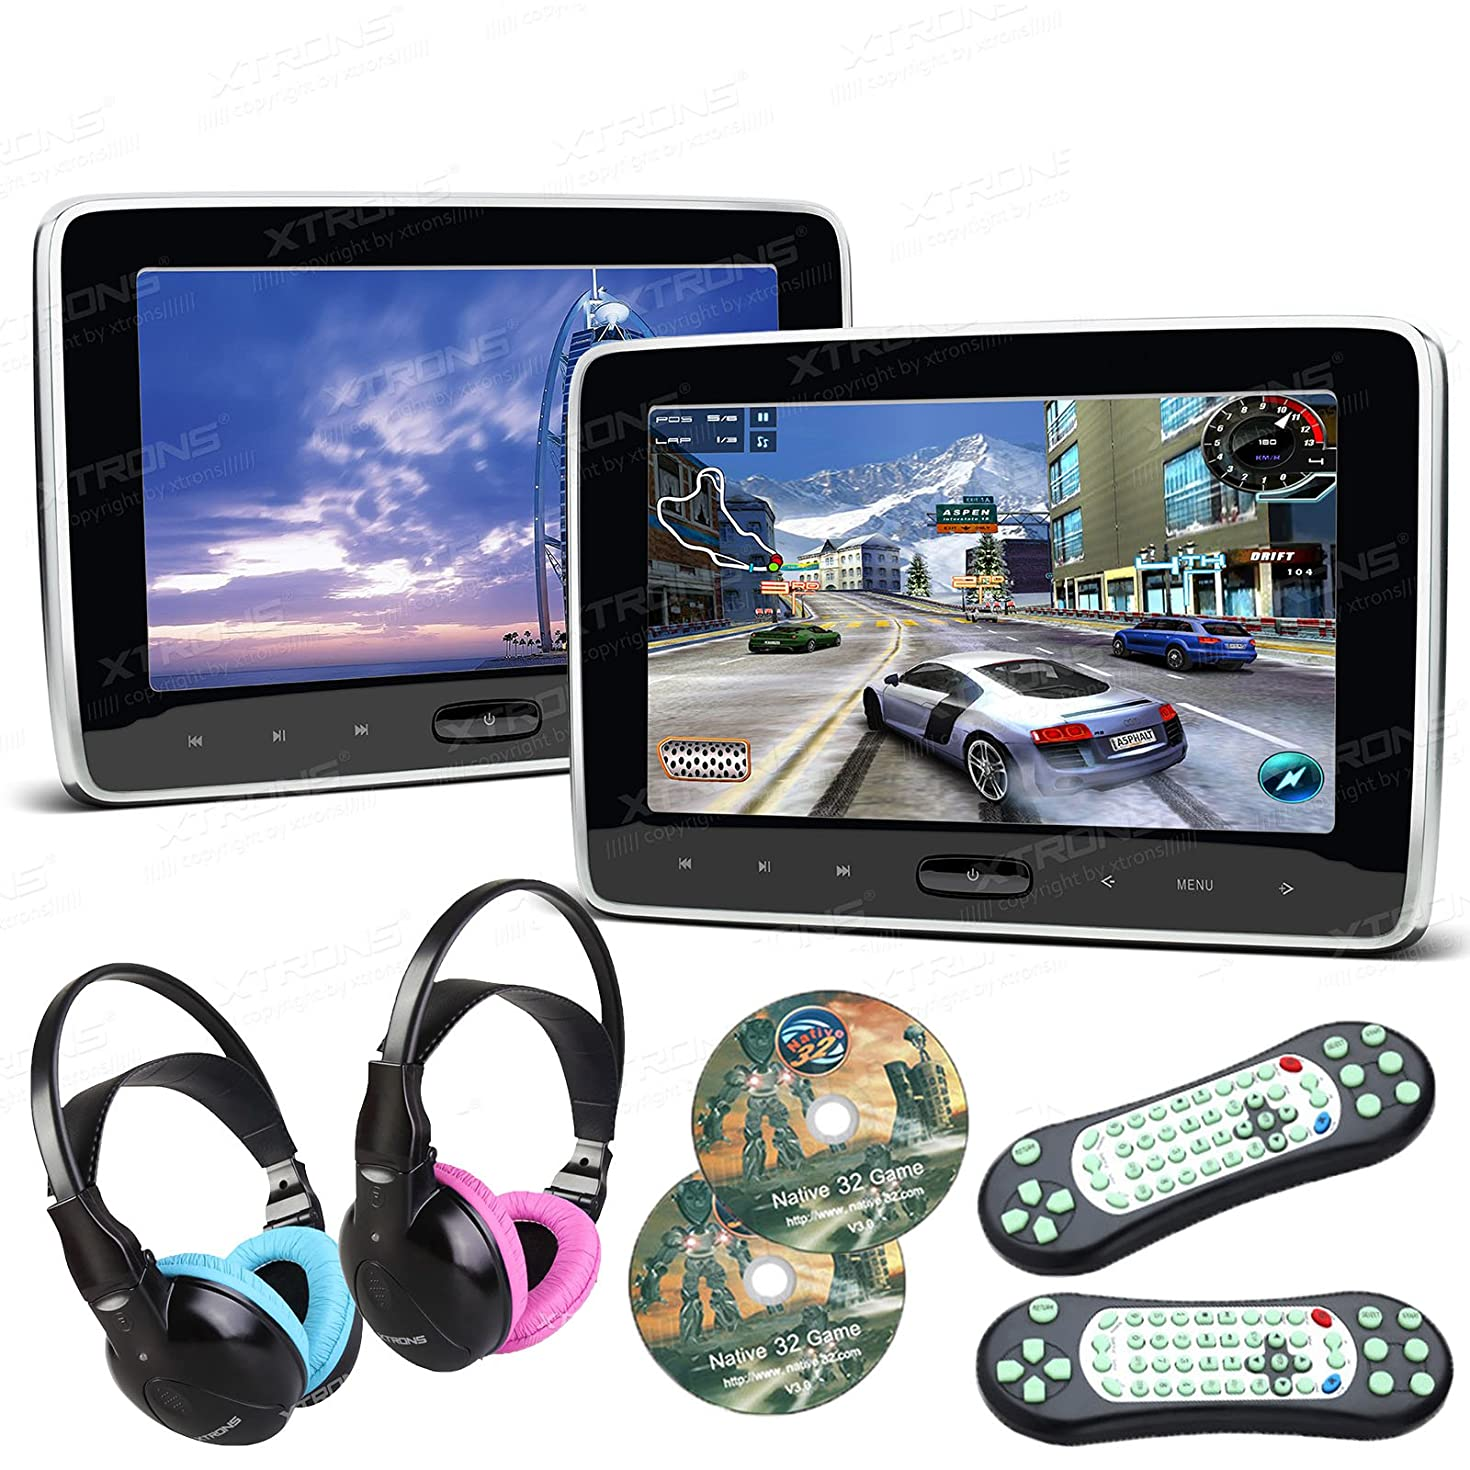 XTRONS Pair 2x10.1 Inch Car Auto Headrest HDMI Slim DVD Player Silver Frame Portable Monitor IR/FM Game Children Headphones Included(BlueΠnk)